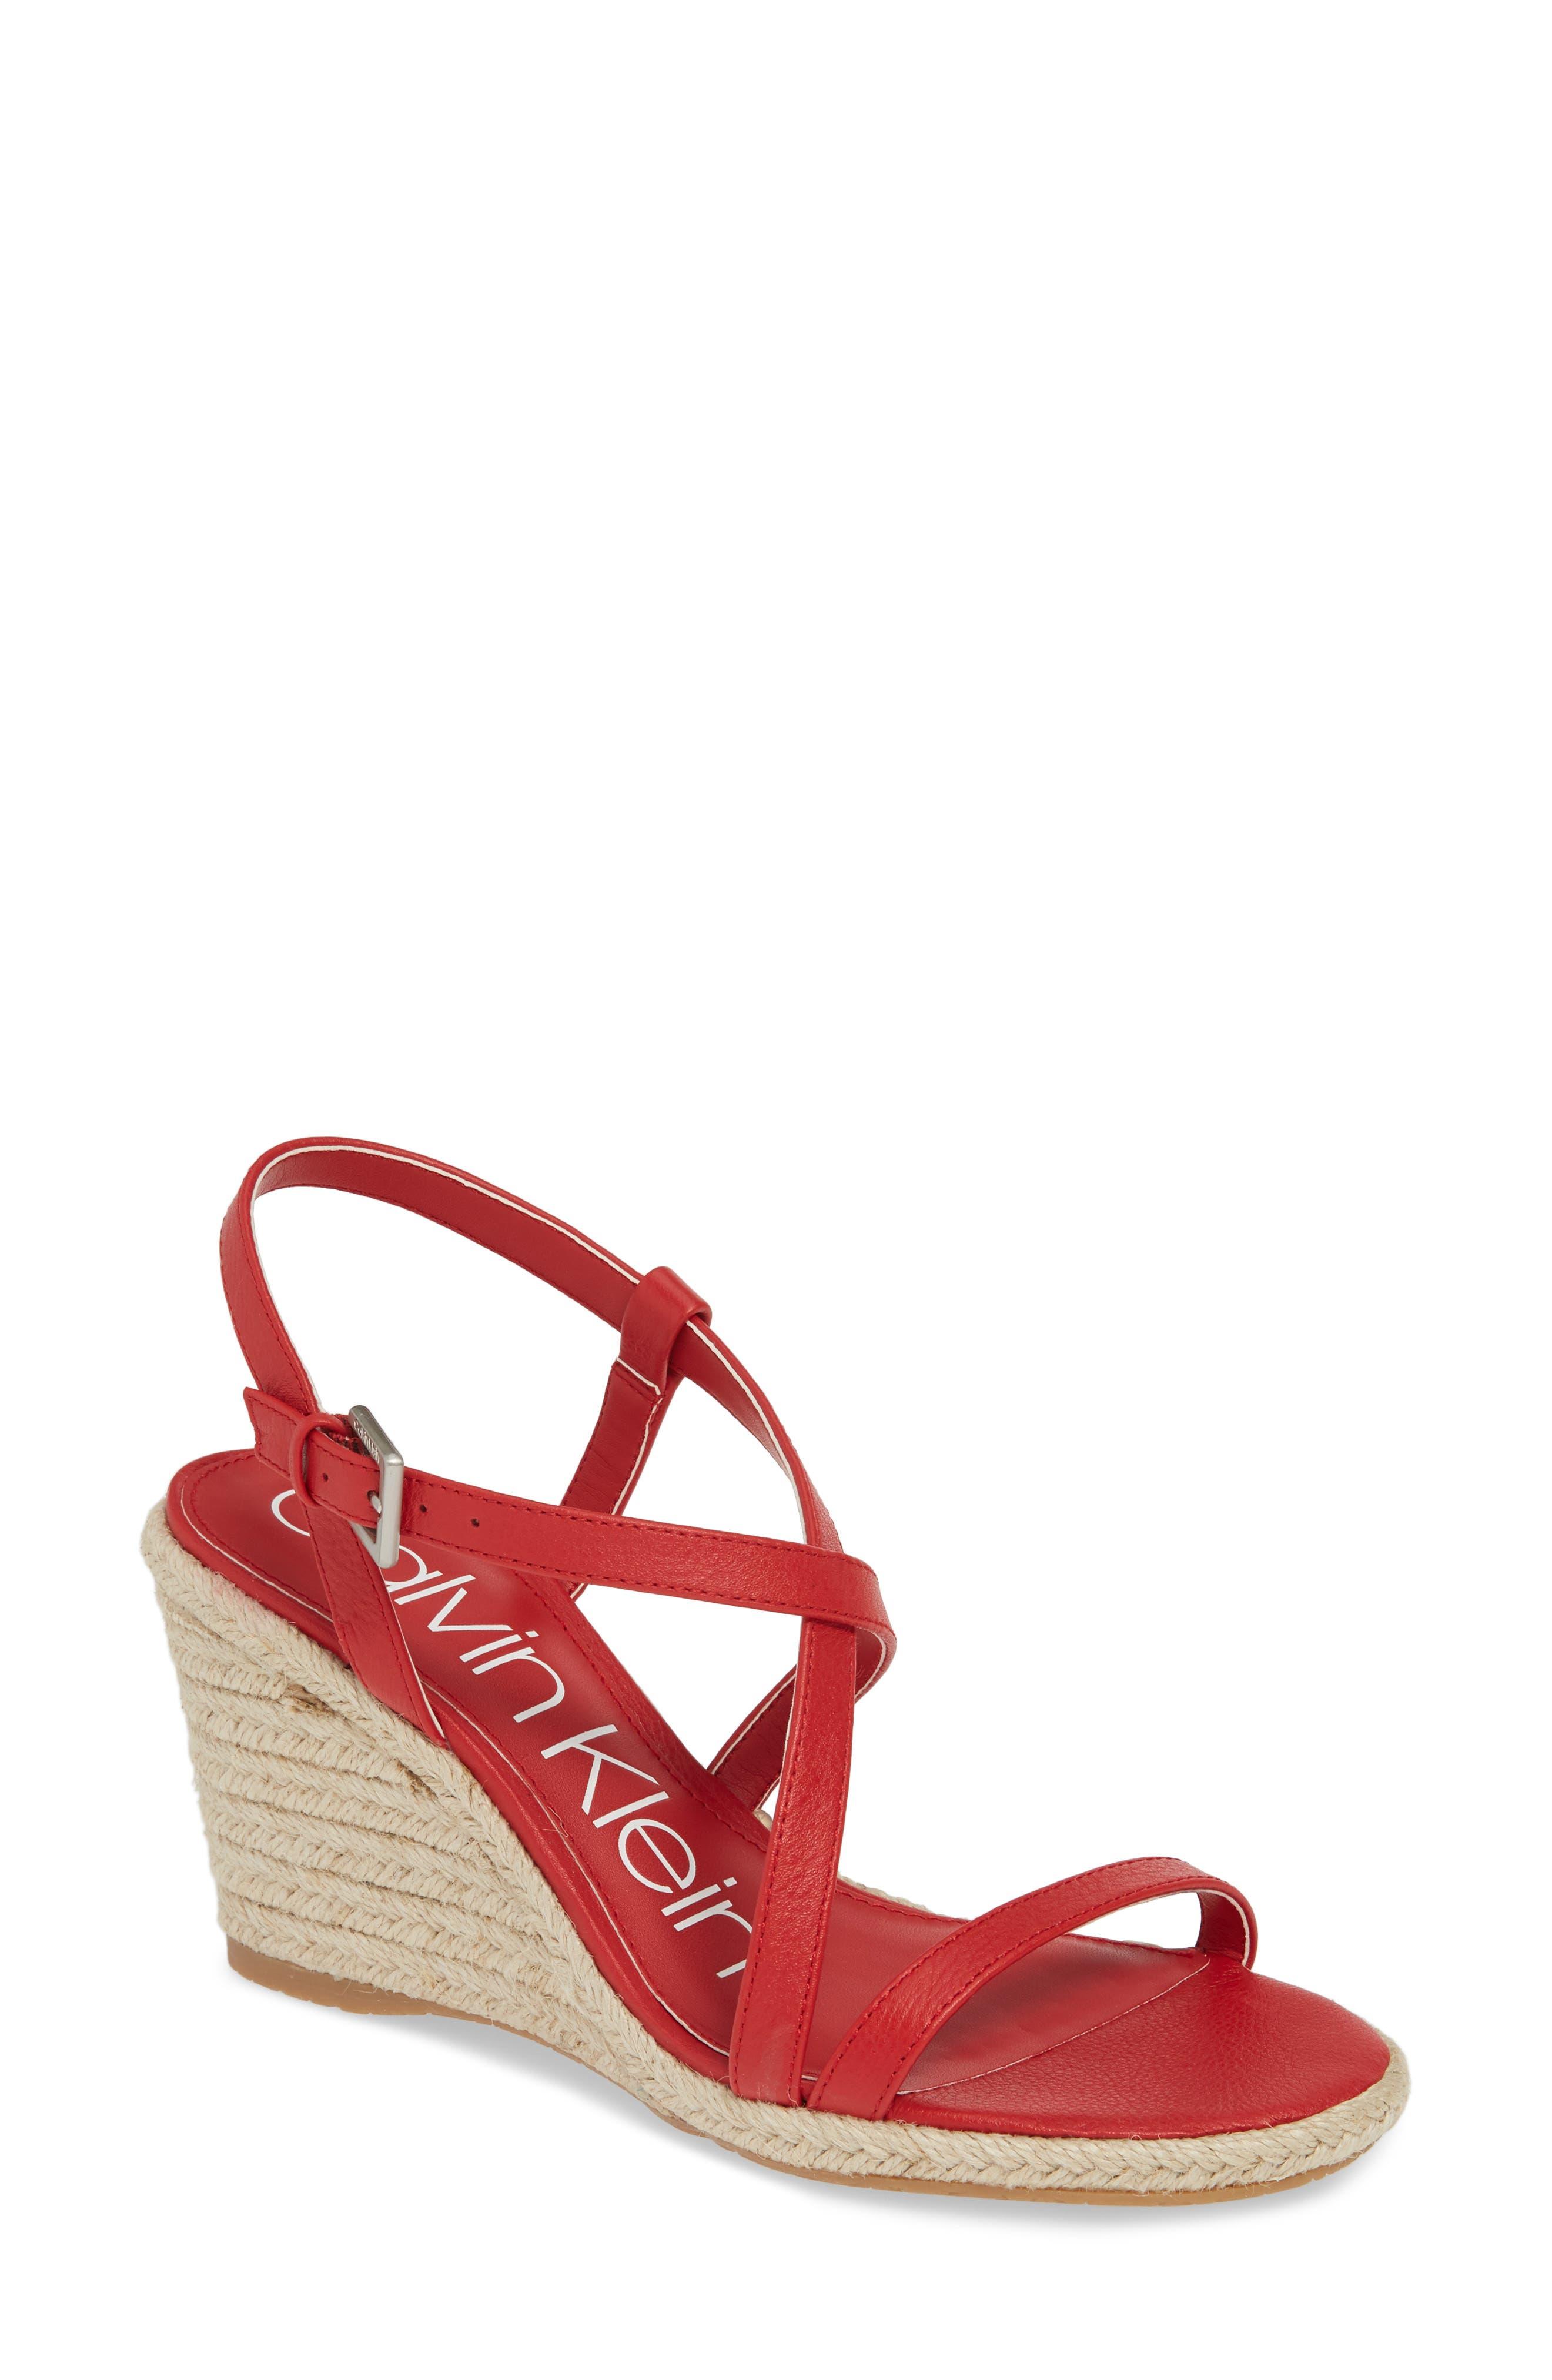 a61c2b9612ee Calvin Klein Bellemine Espadrille Wedge Sandal